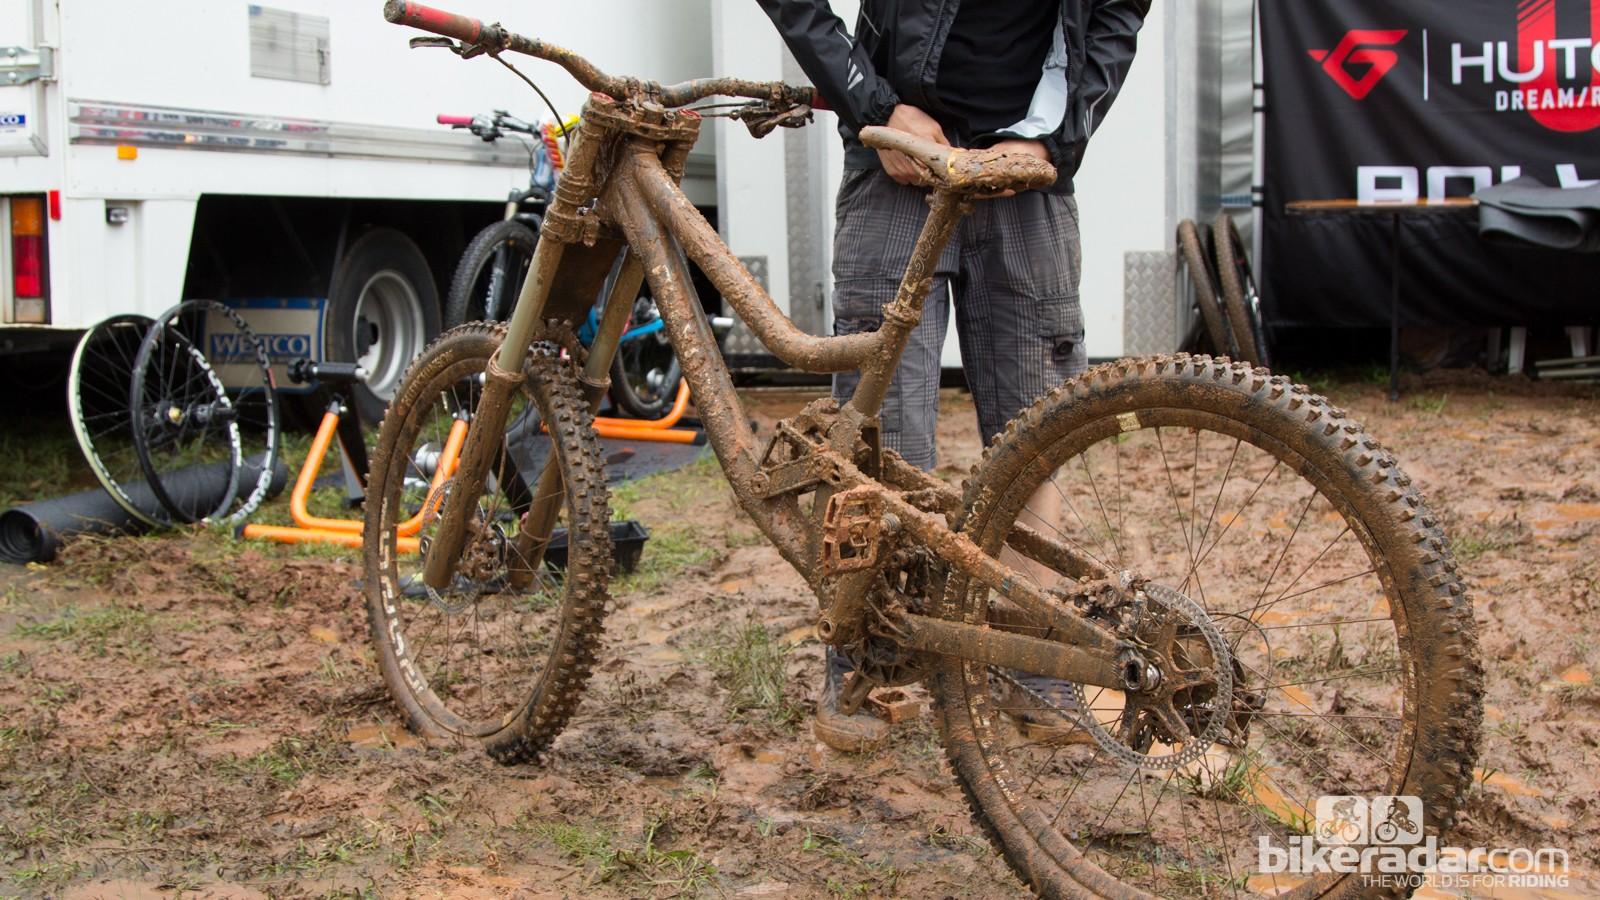 dirty-bike-1515765432685-17b4shj0s2c6w-f075d4b